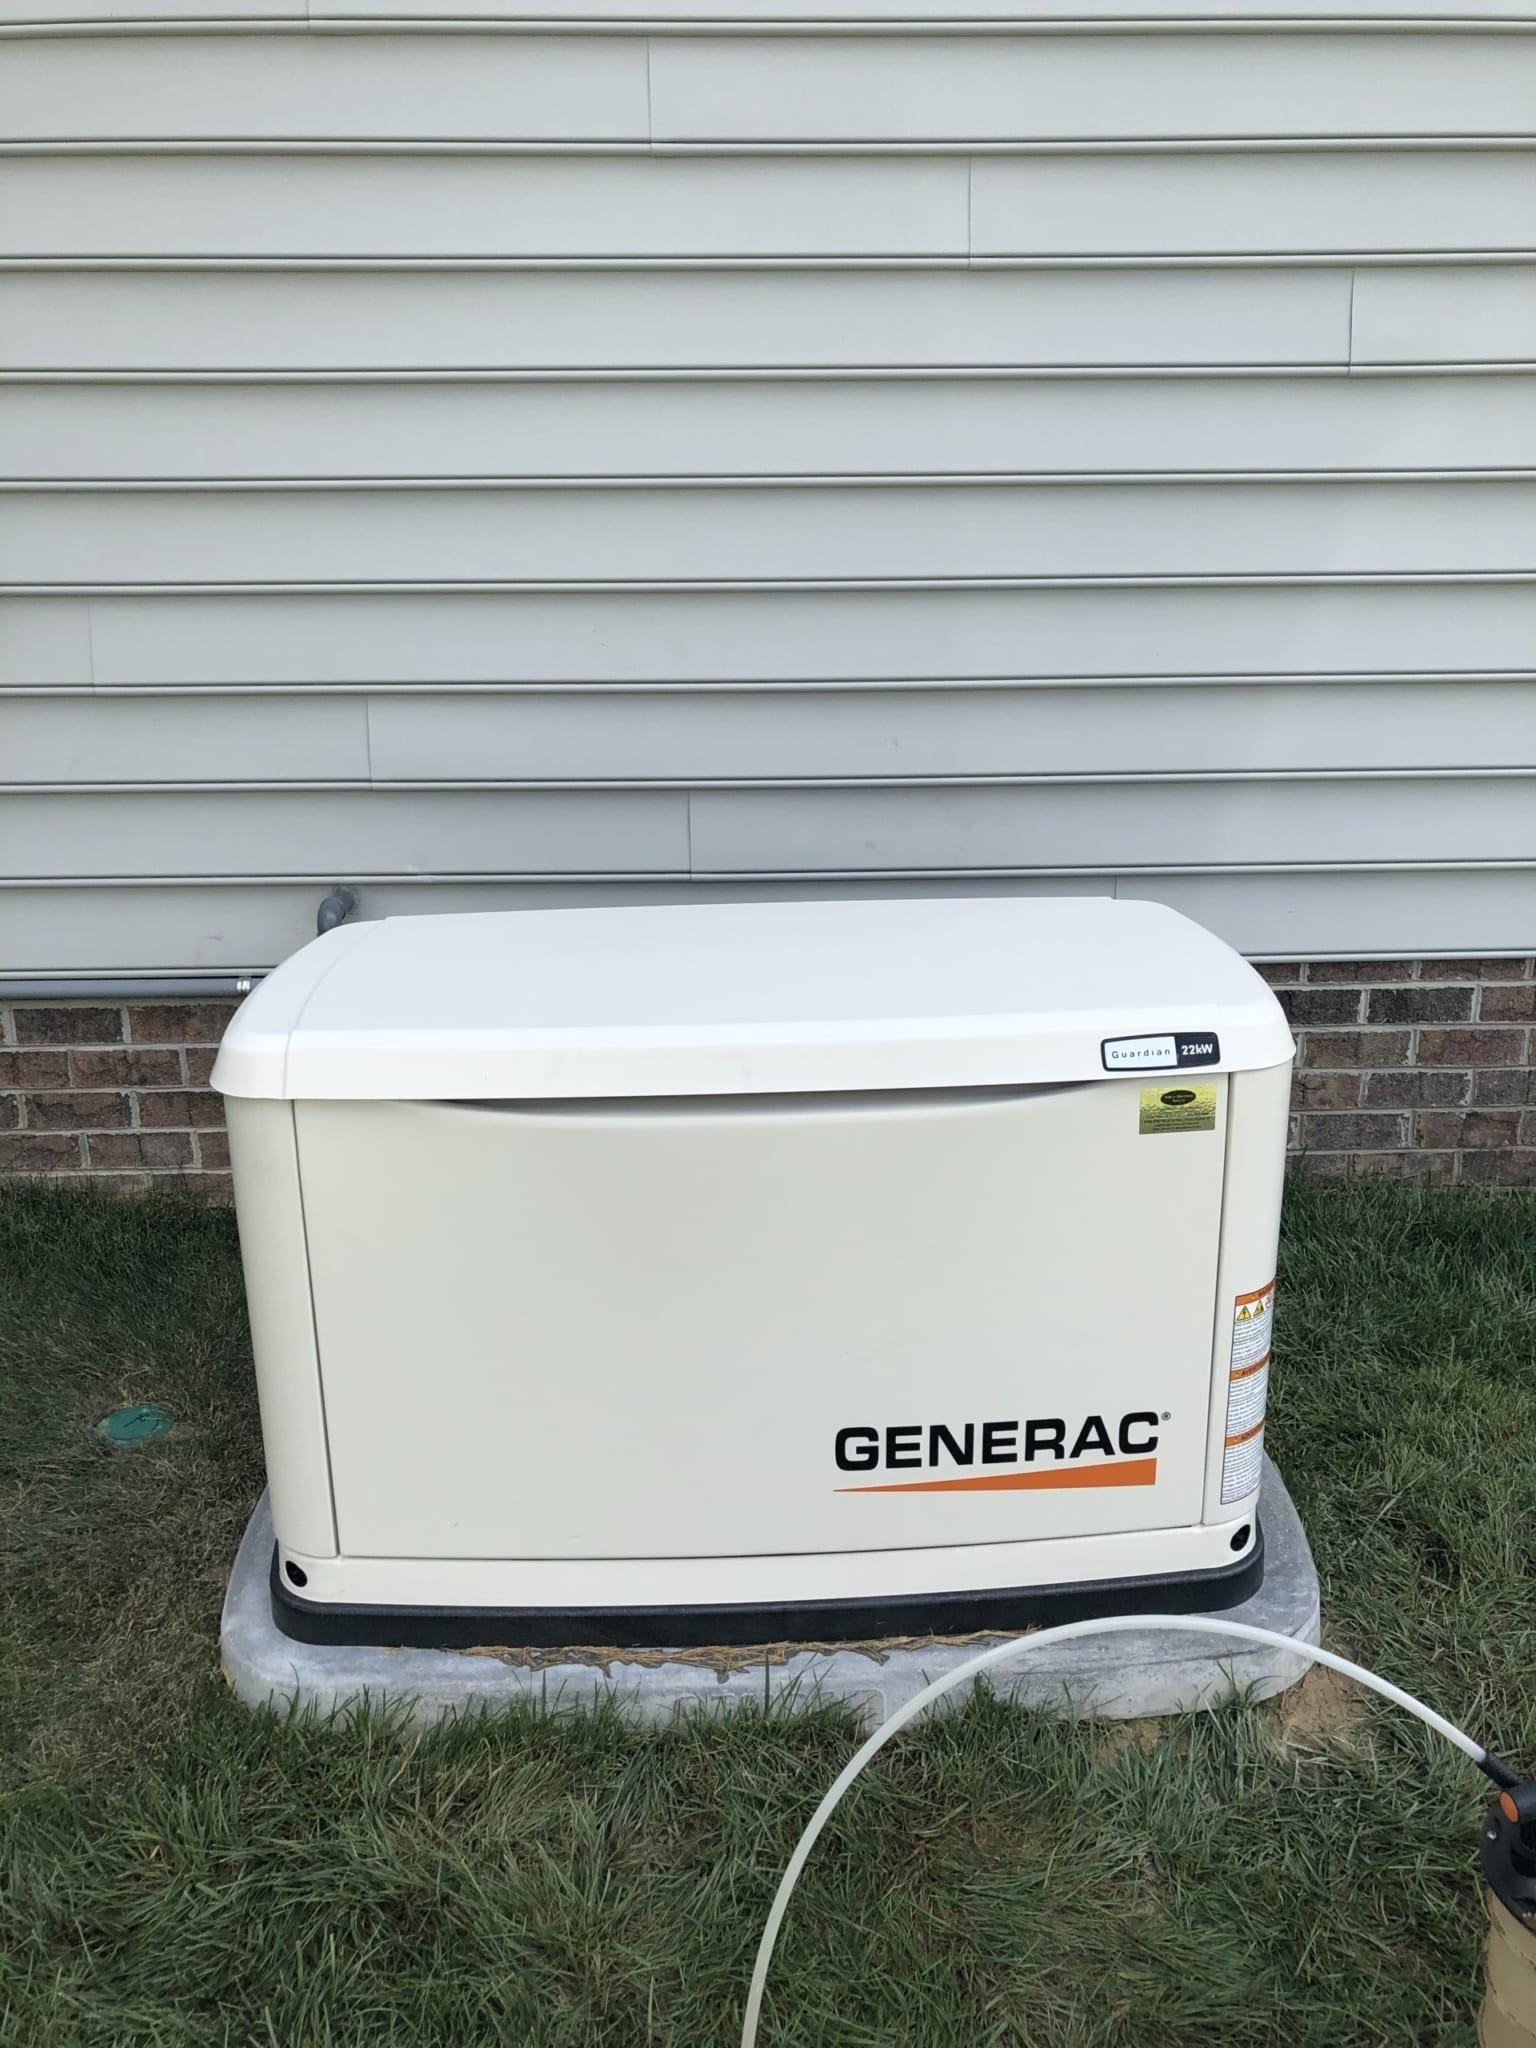 7.8.20 Generac Automatic Standby Generator